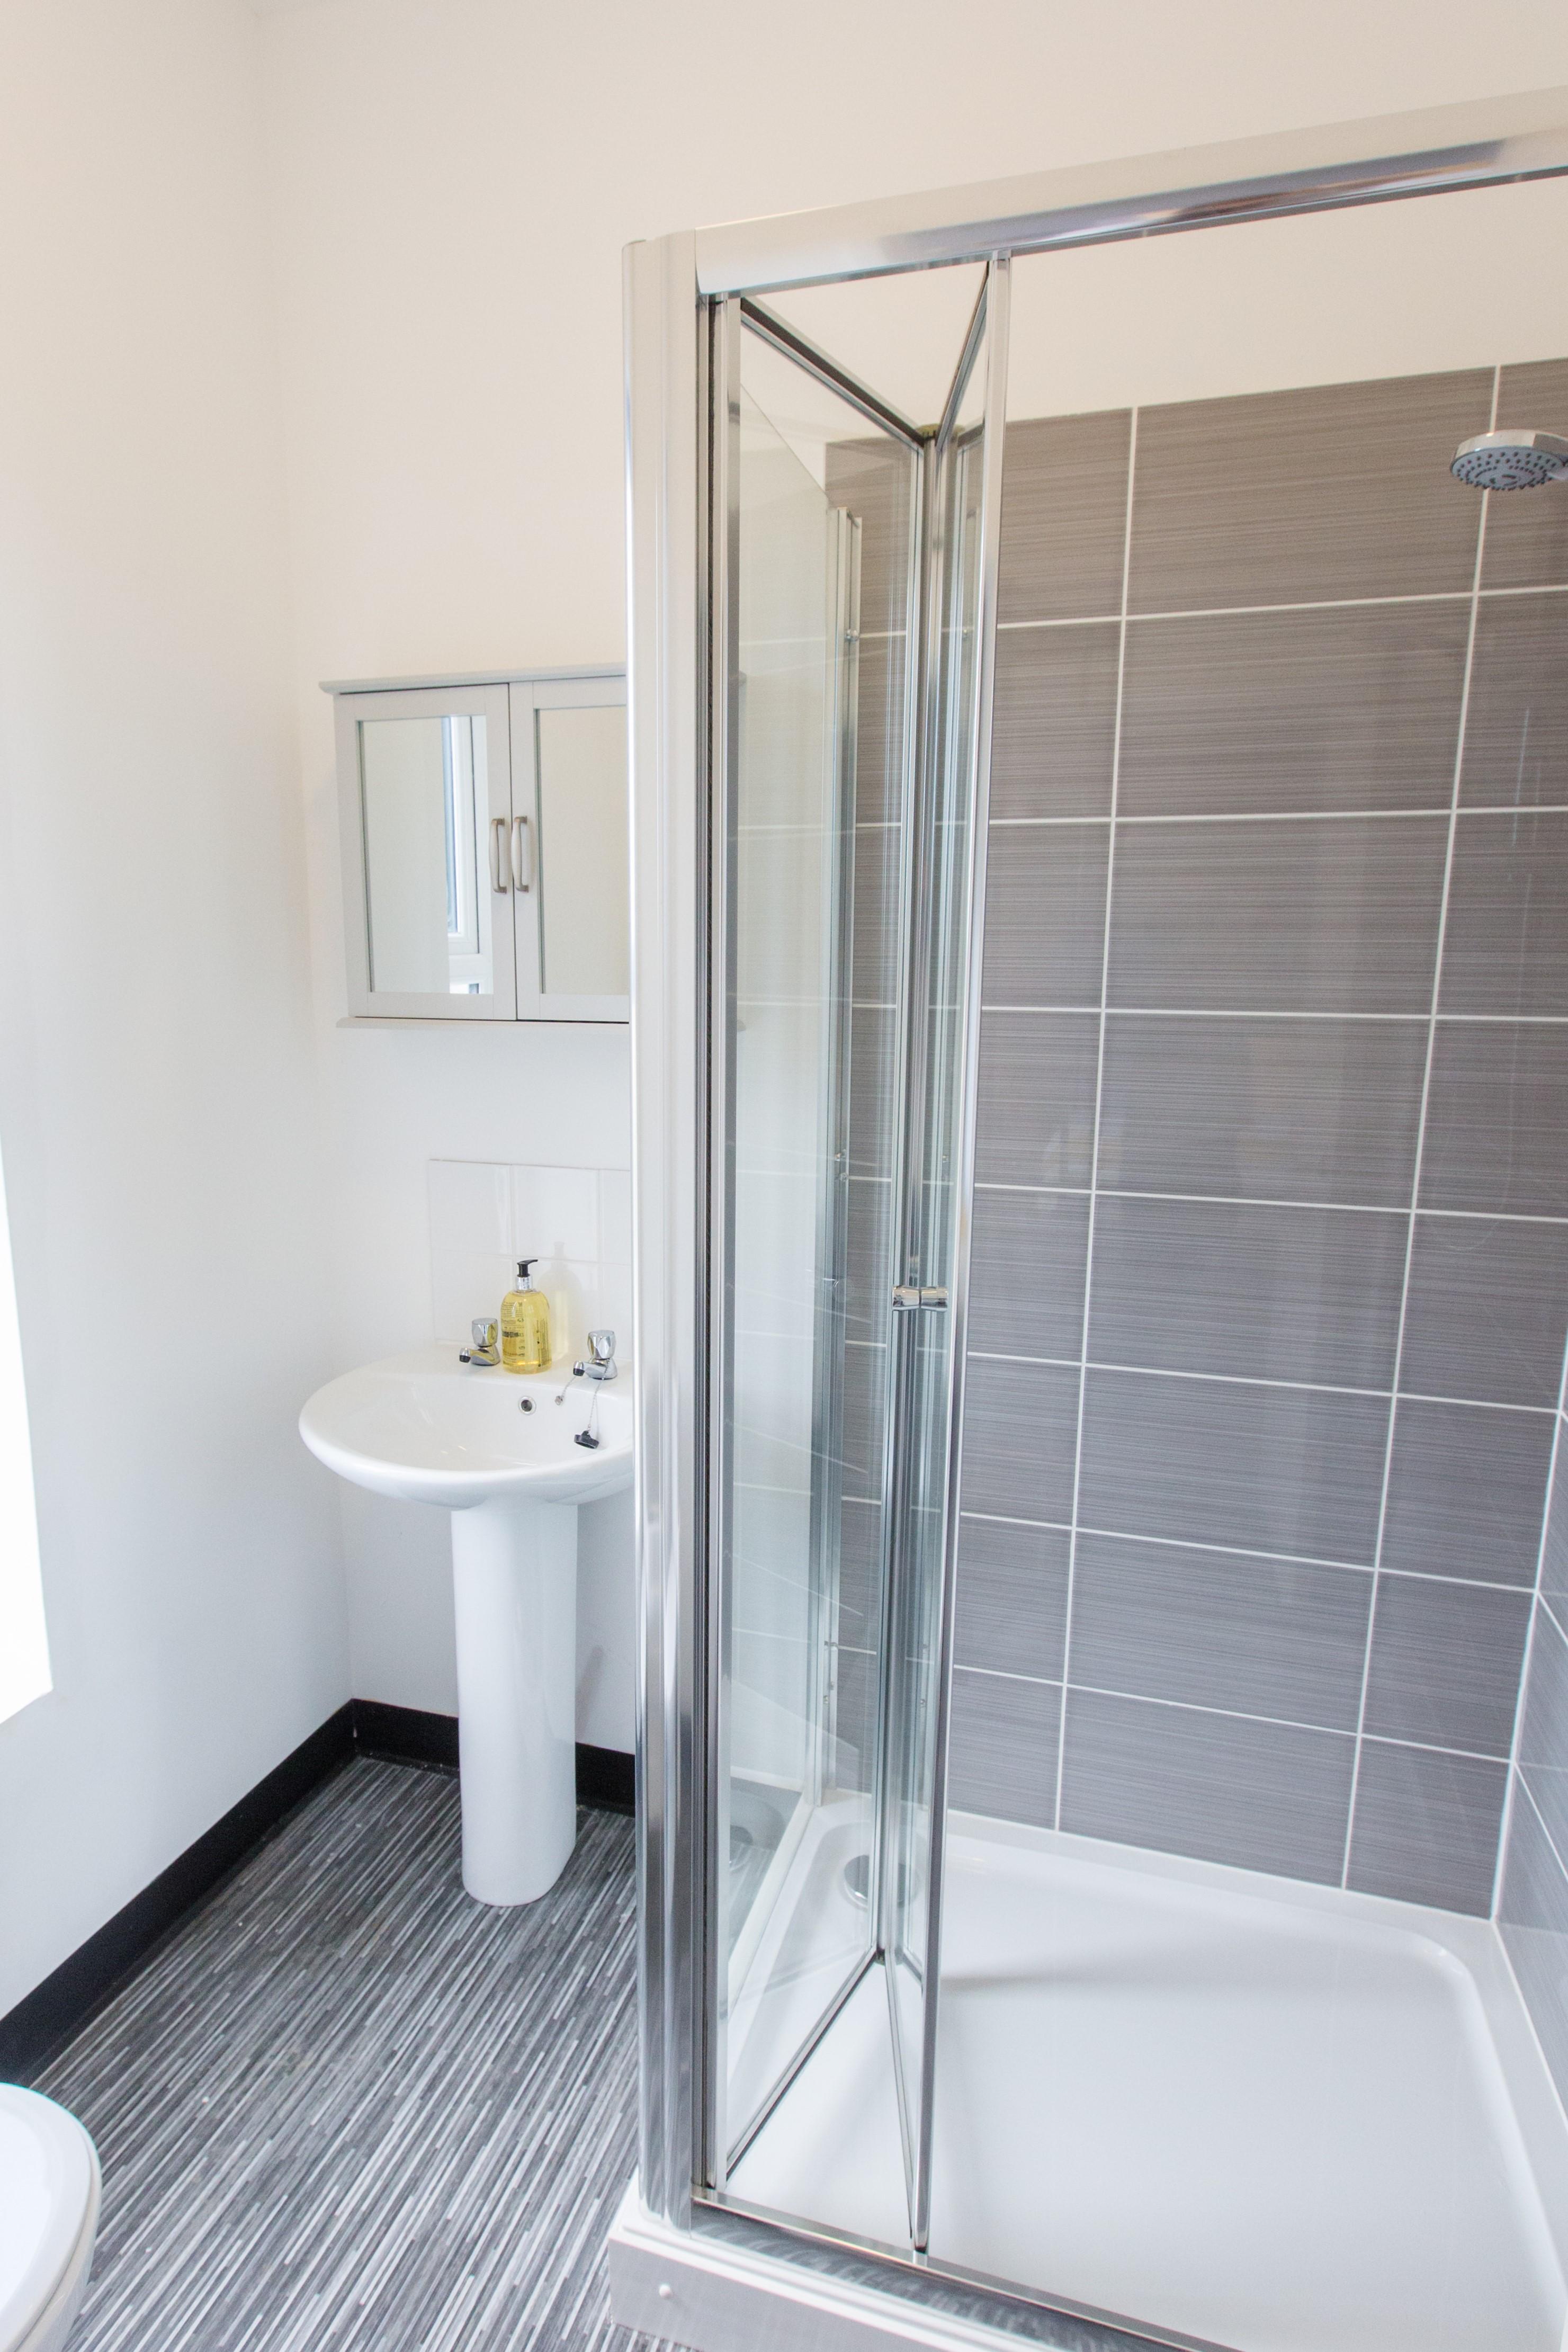 HMO shower room